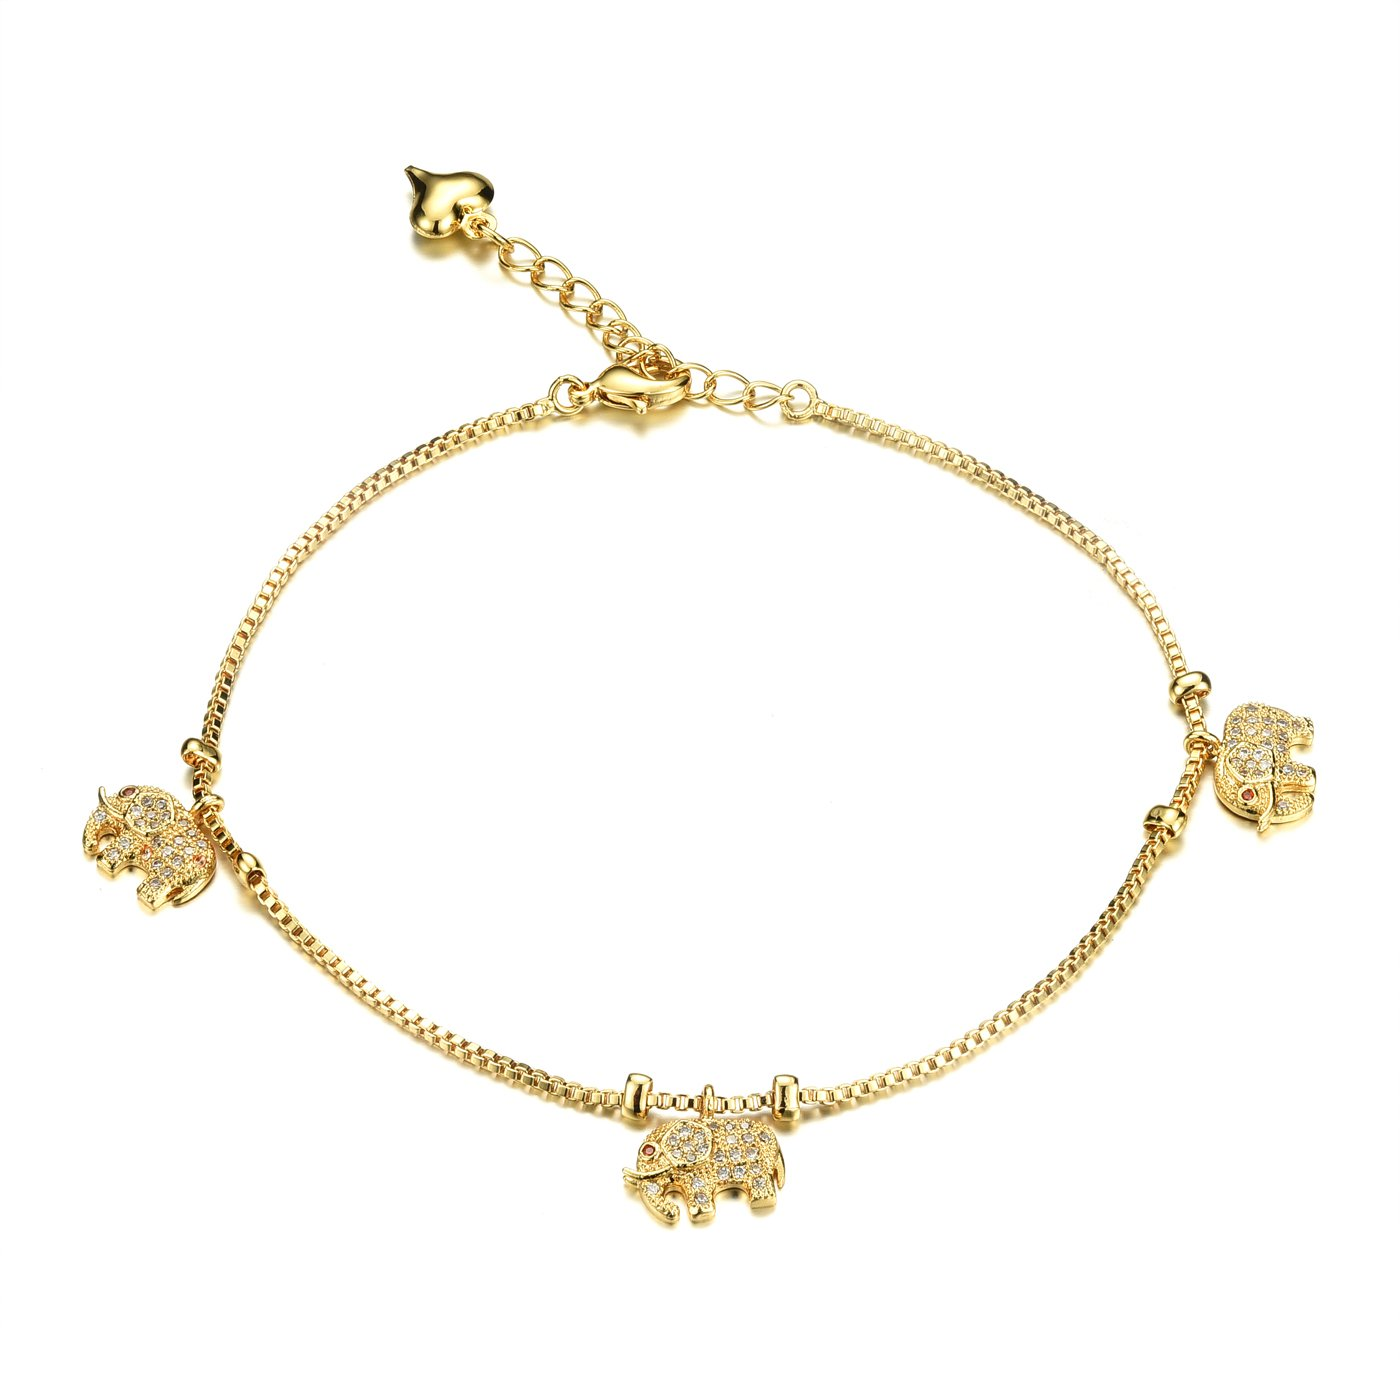 Fashion Aanklets 18K Gold Tone Rhinestone Elephant Beach Foot Chain Aanklet for Women L8.19+1.5''